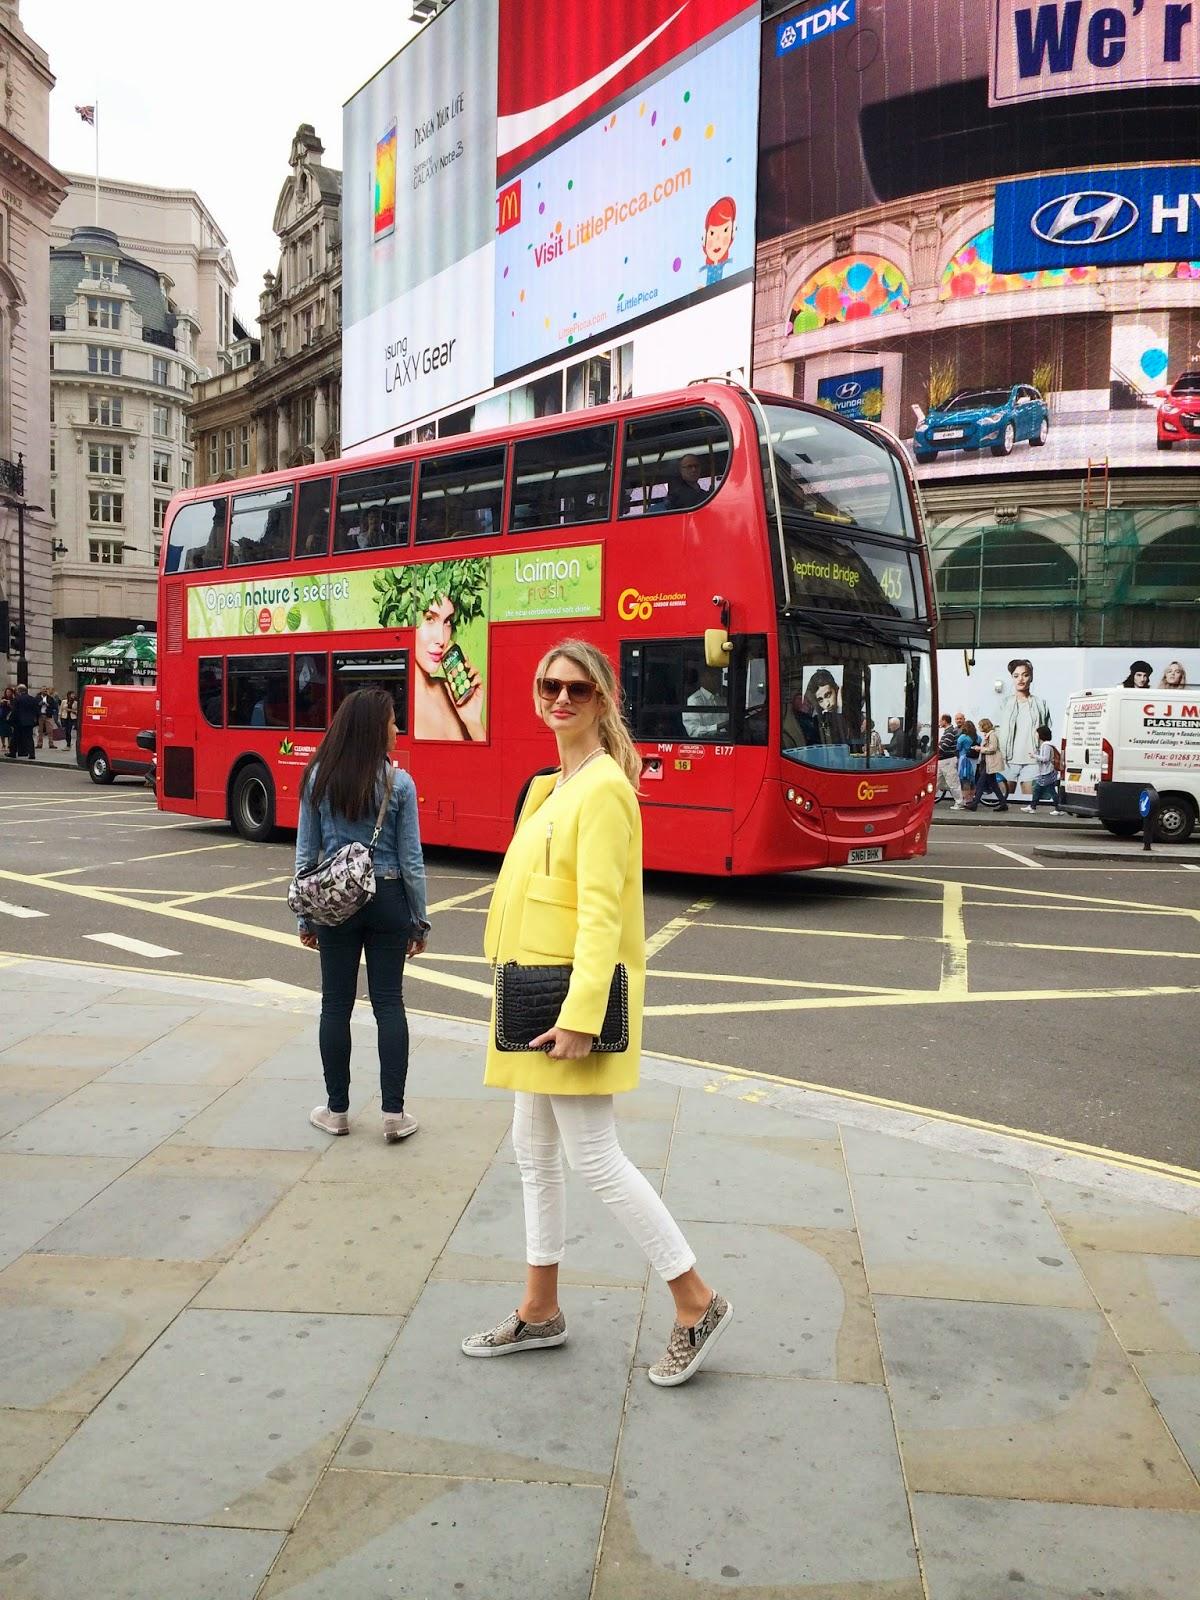 London, Piccadilly, london bus, red bus, zara coat, yellow coat, zara yellow coat, white jeans, skinny jeans white, slipons, snakeprint slipons, zara croco bag, london fashion blogger, london street style